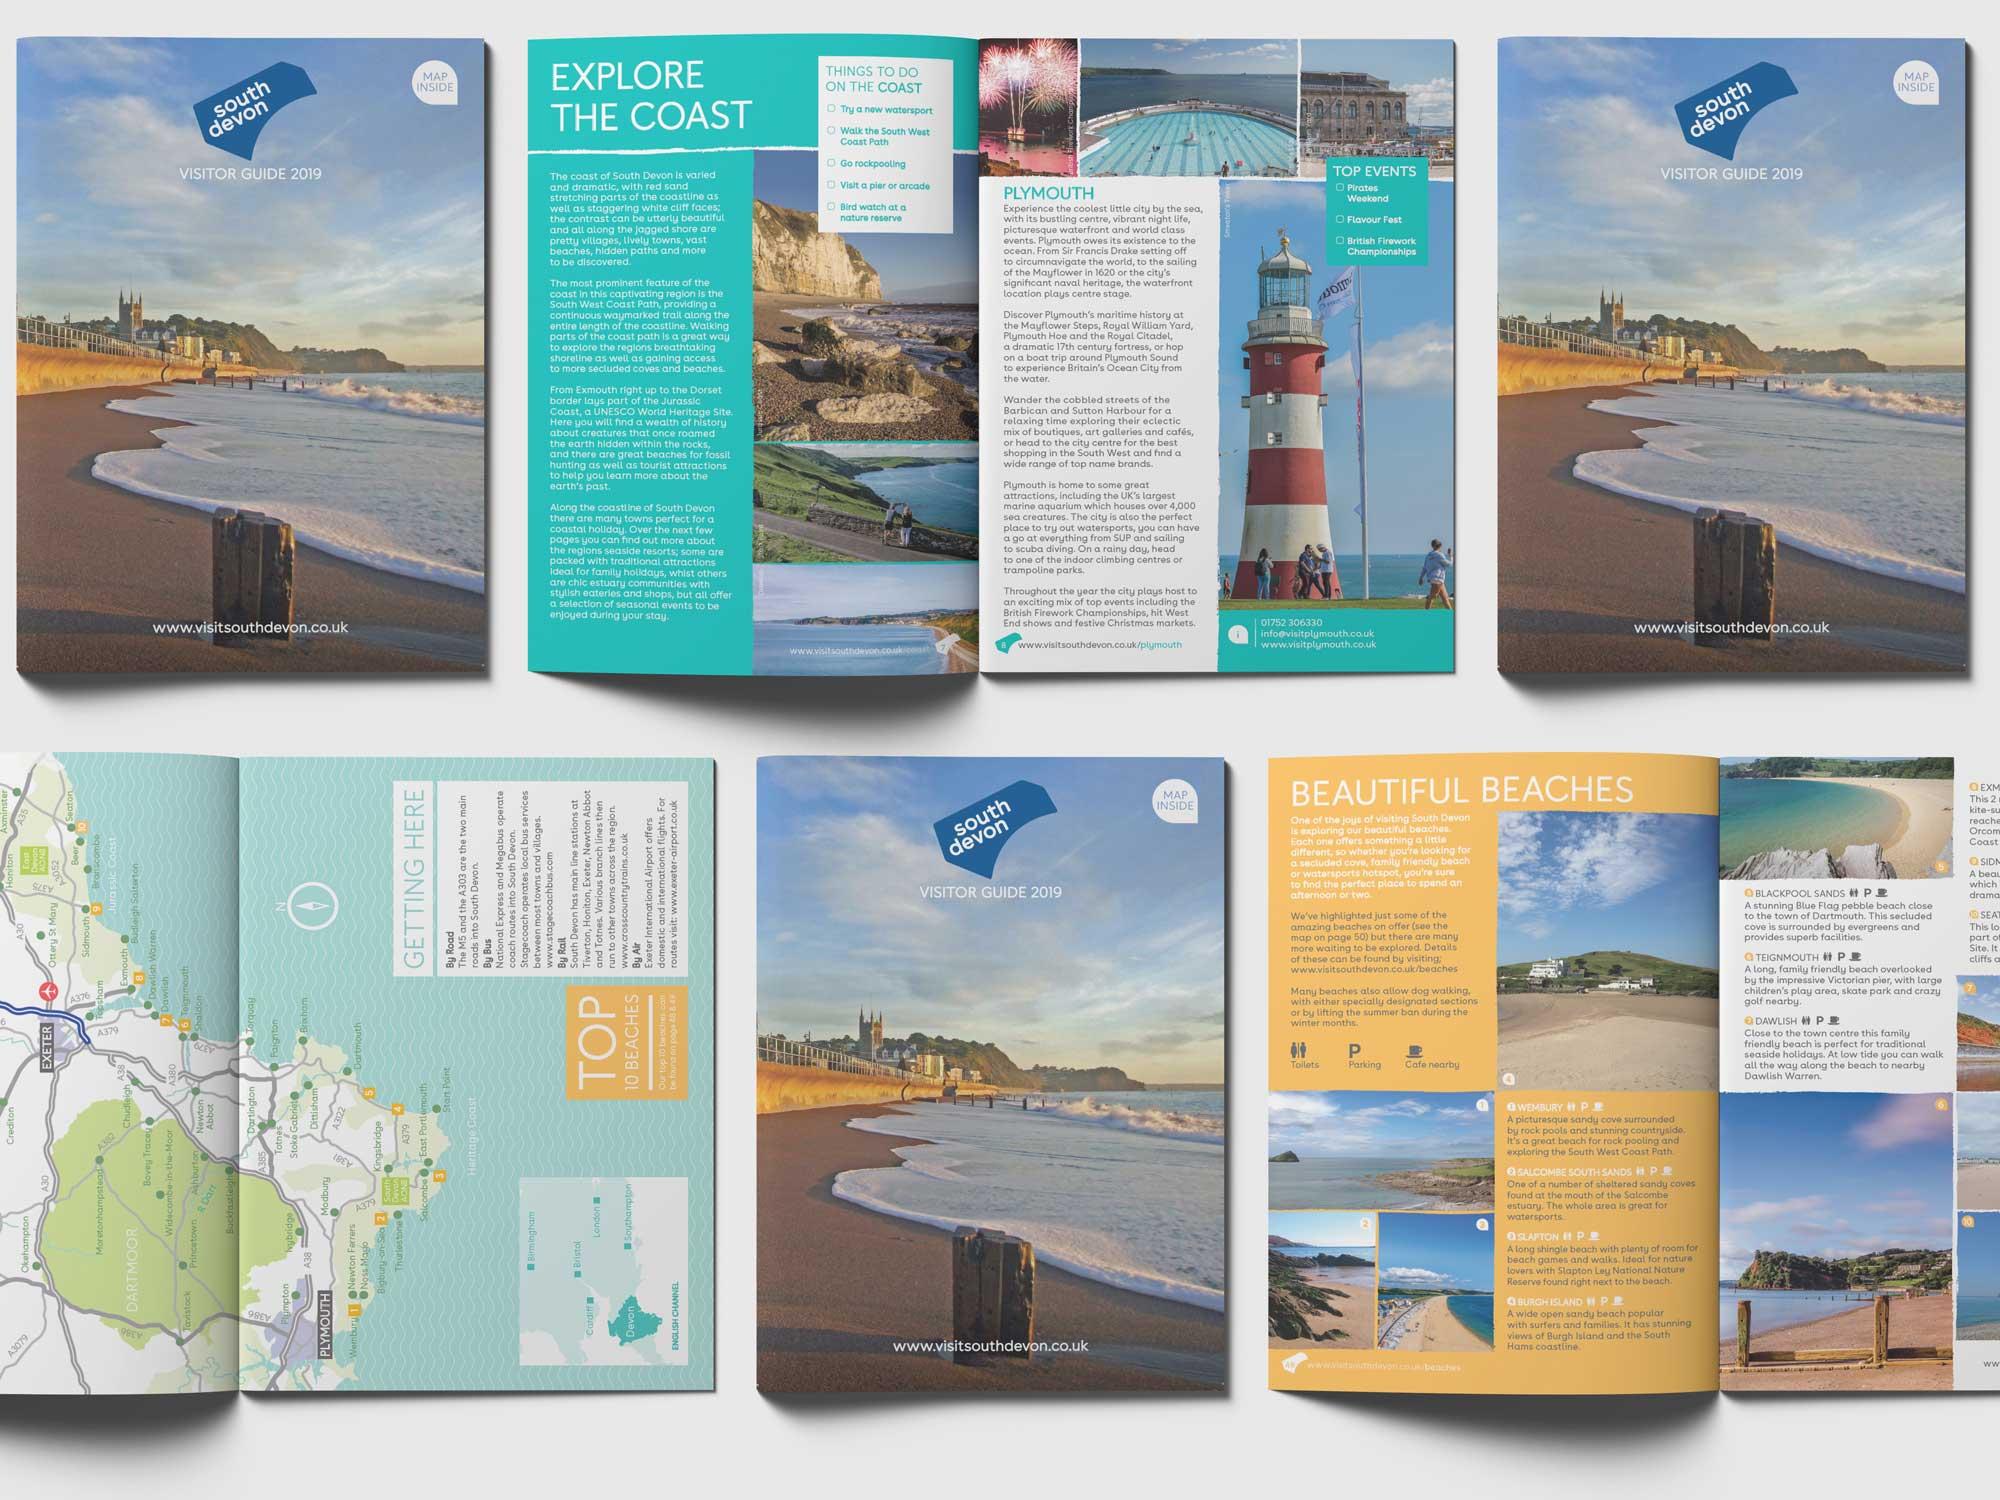 South devon guide layouts